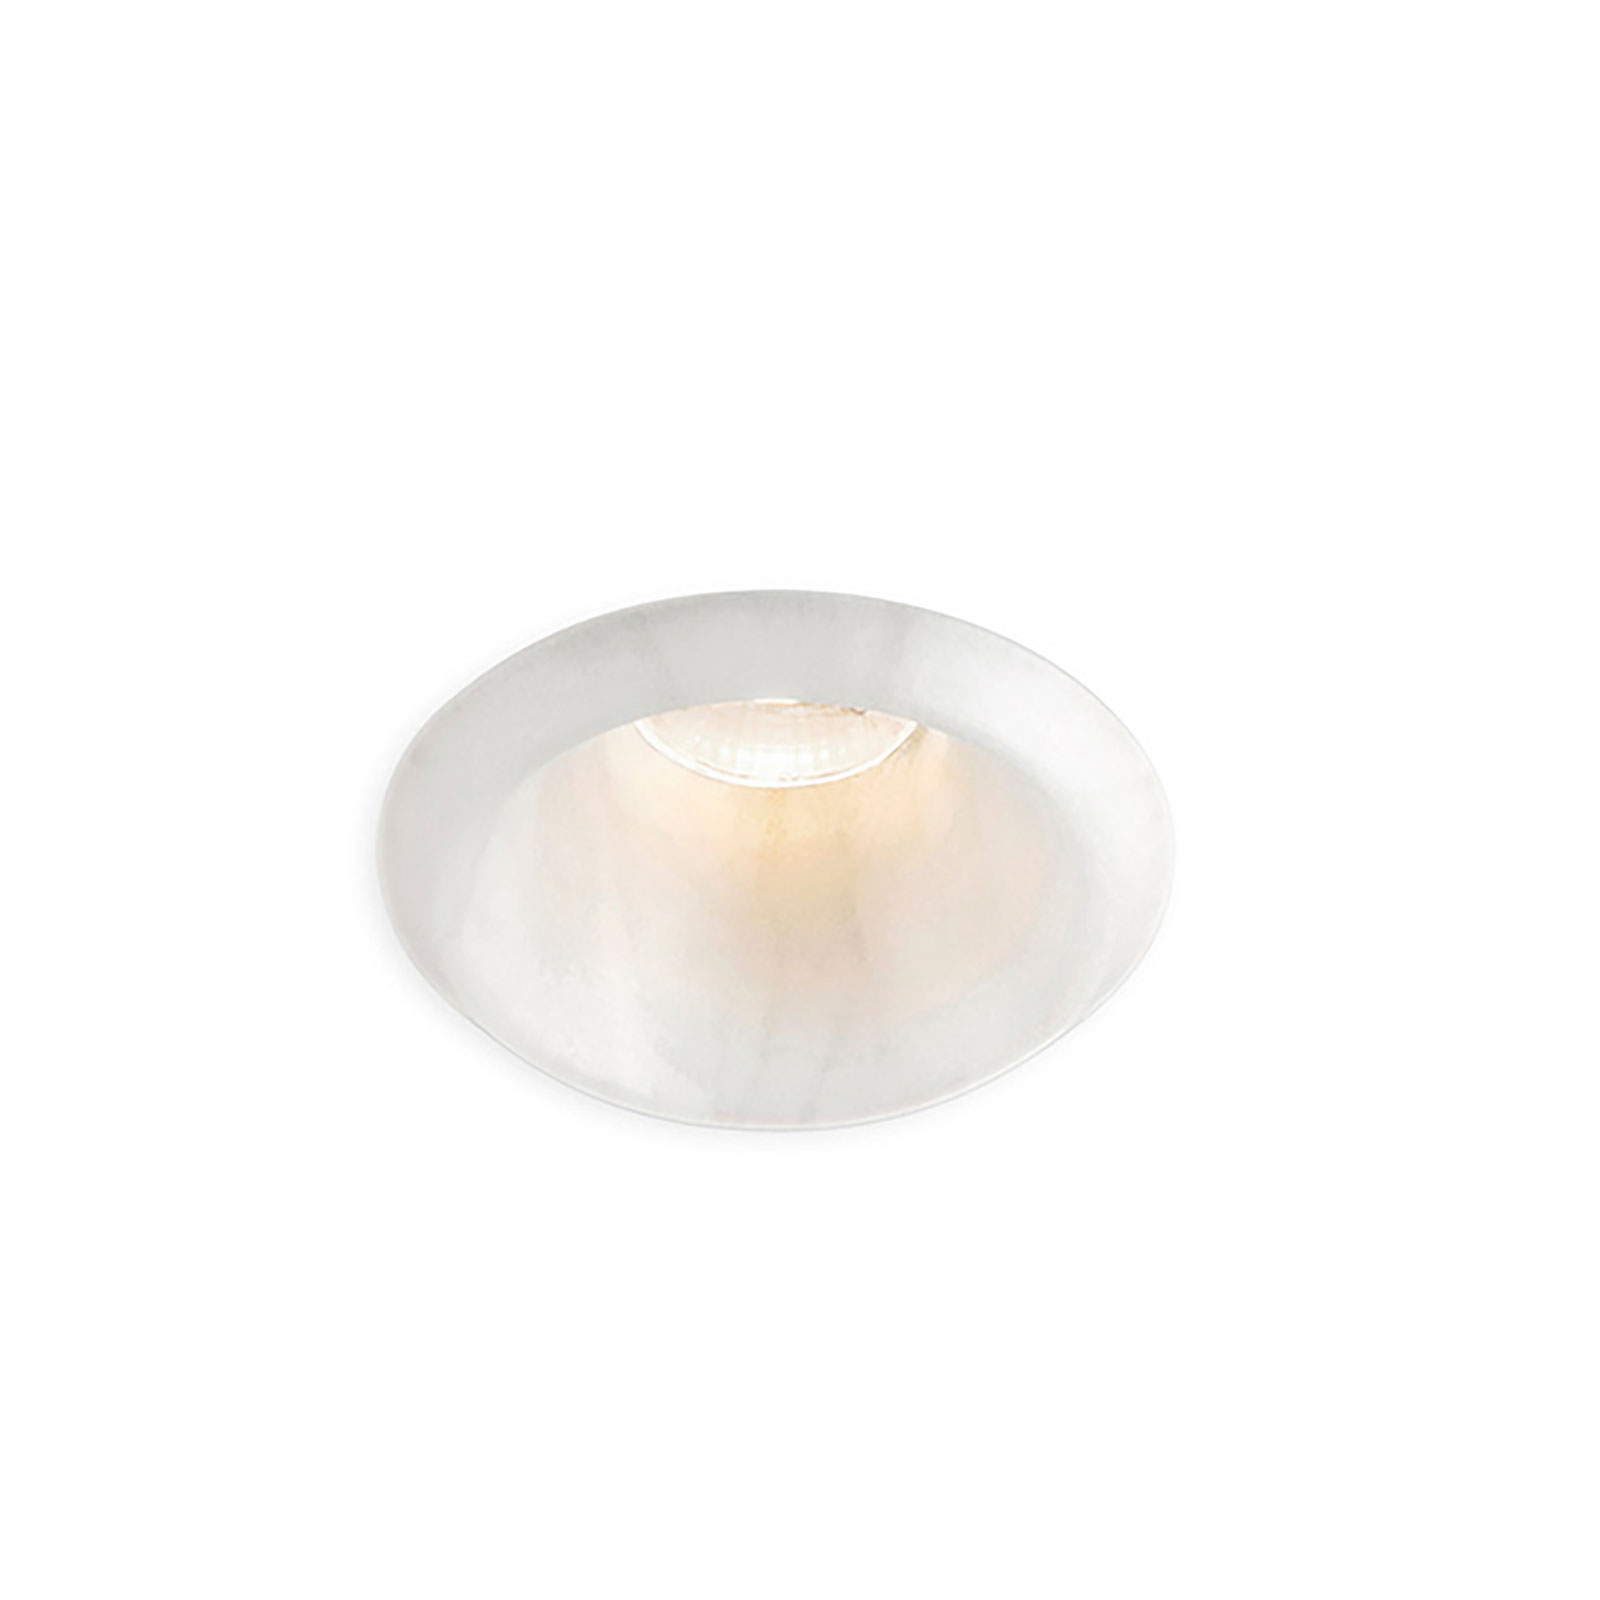 LEDS-C4 Play Raw Downlight Alabaster 927 12W 15°